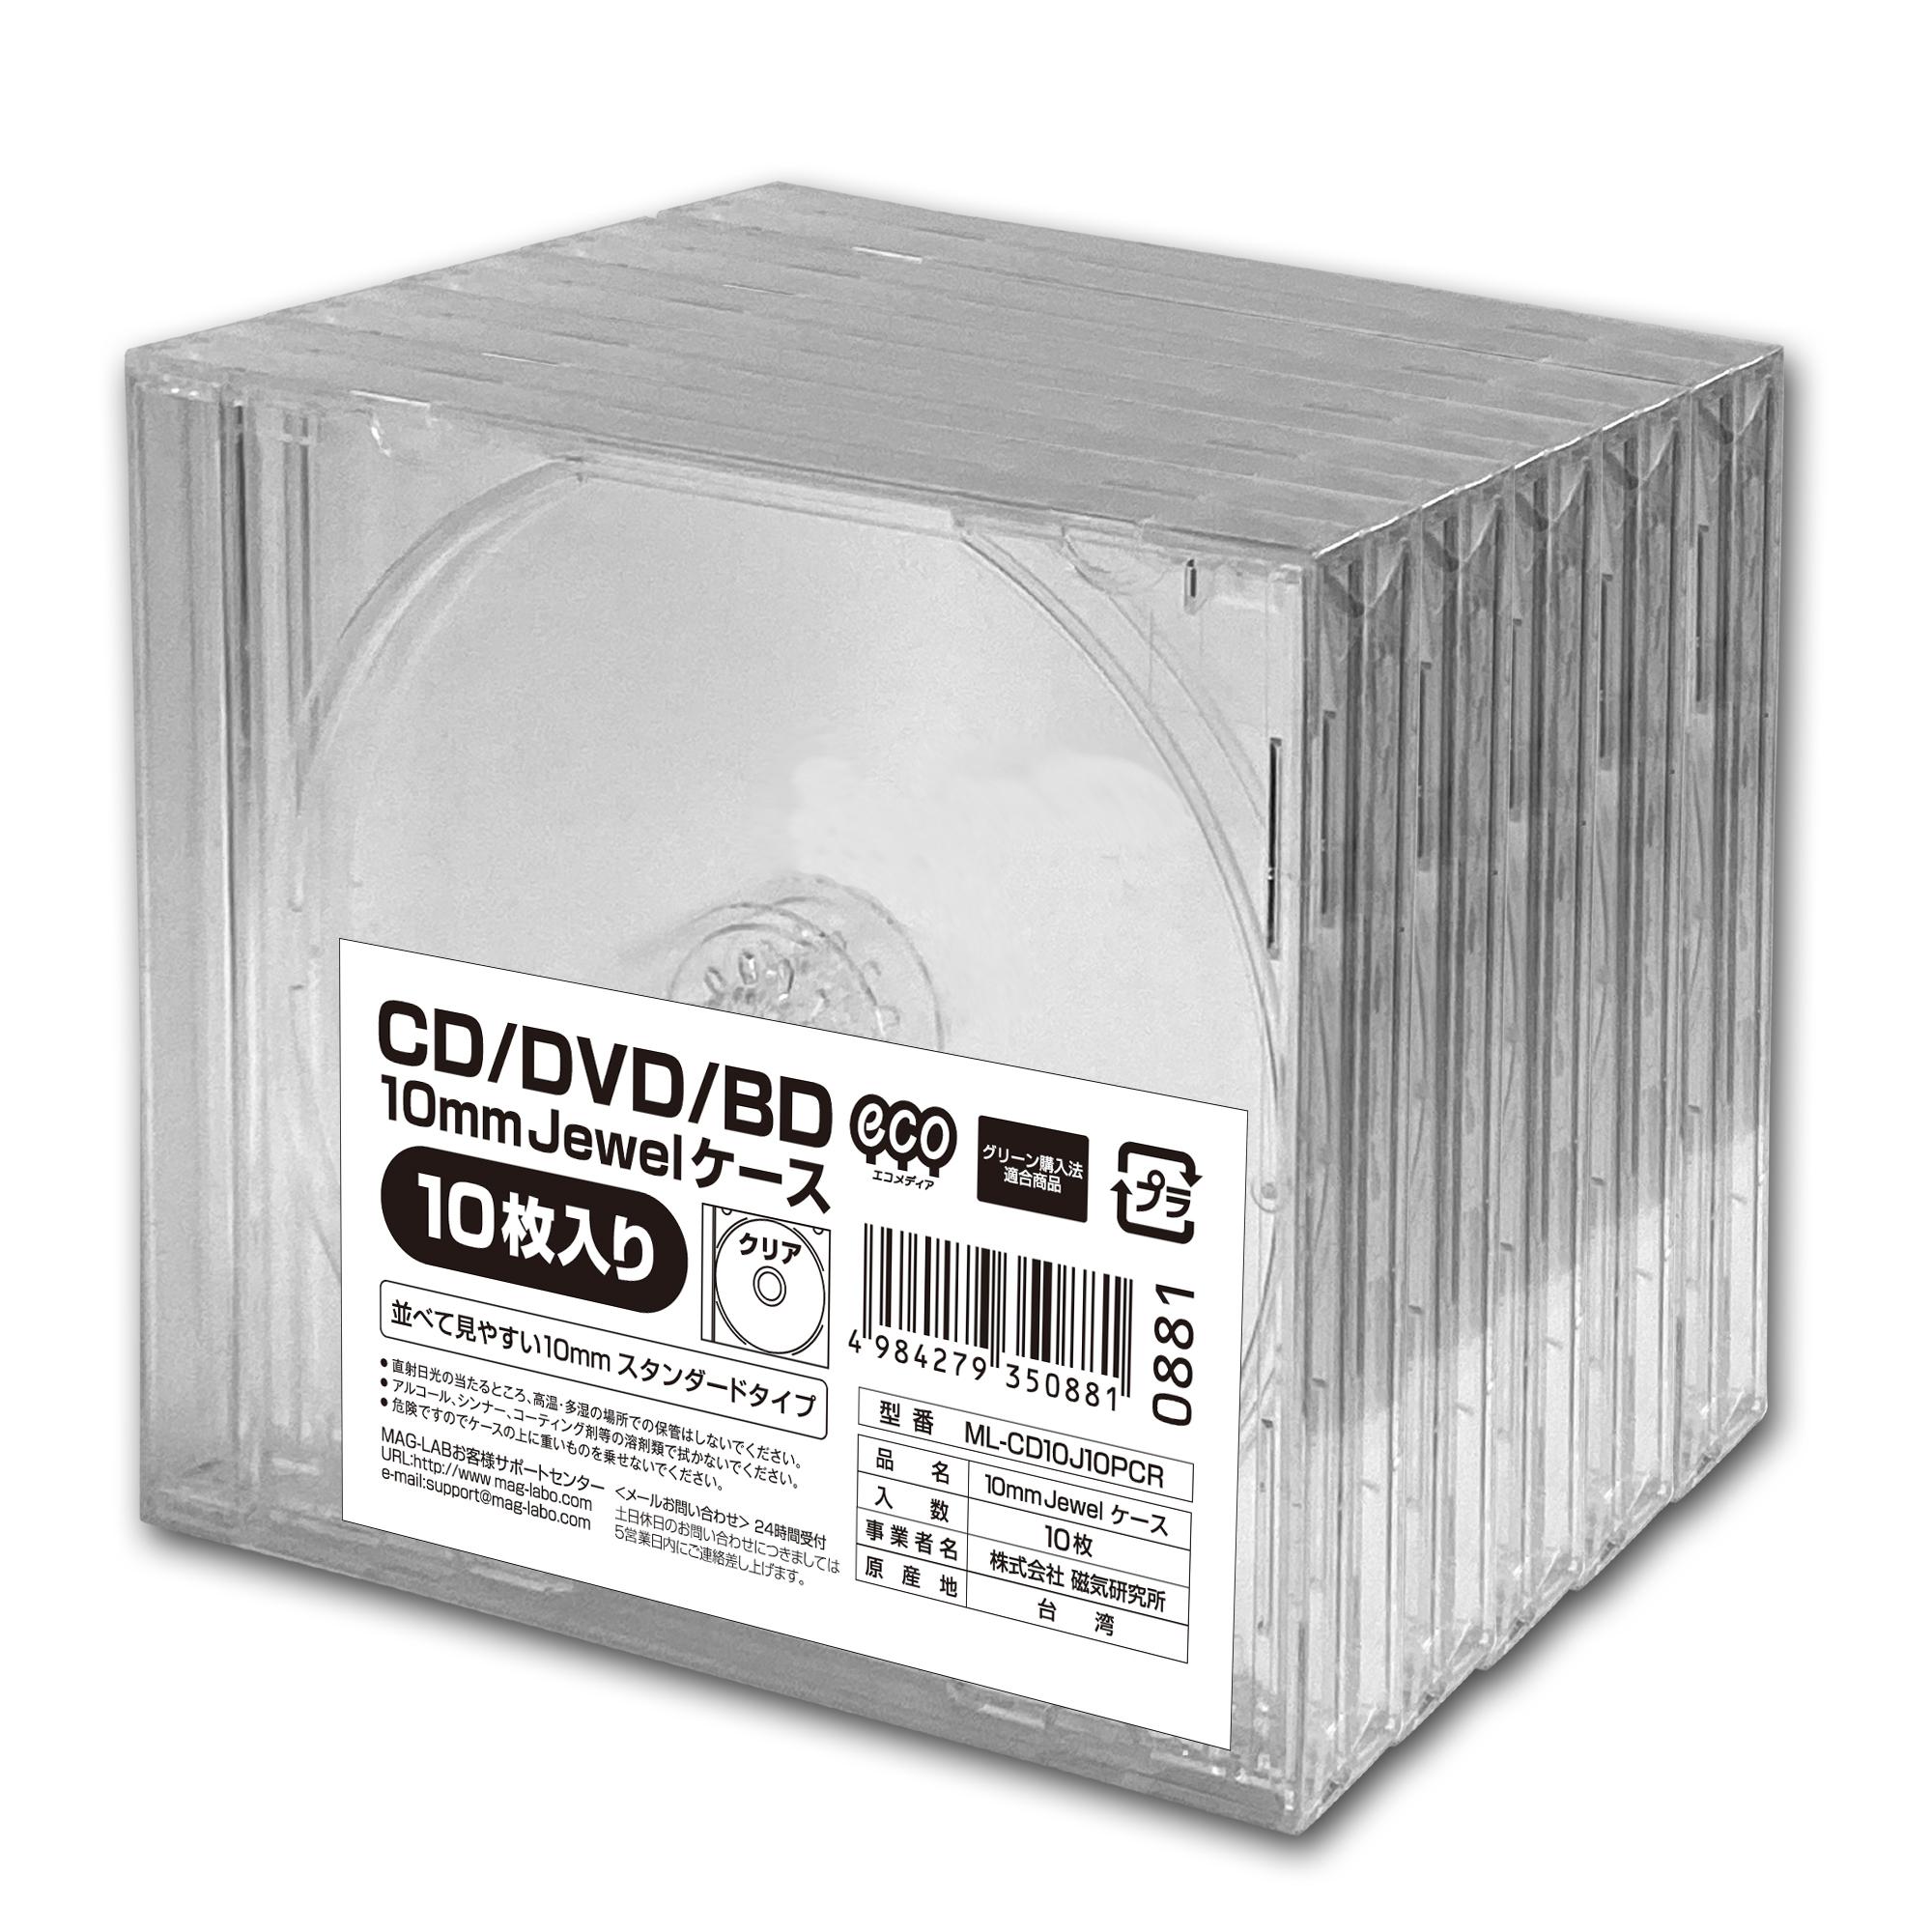 CD/DVD/BD 1枚収納 10mmスリムケース 10枚